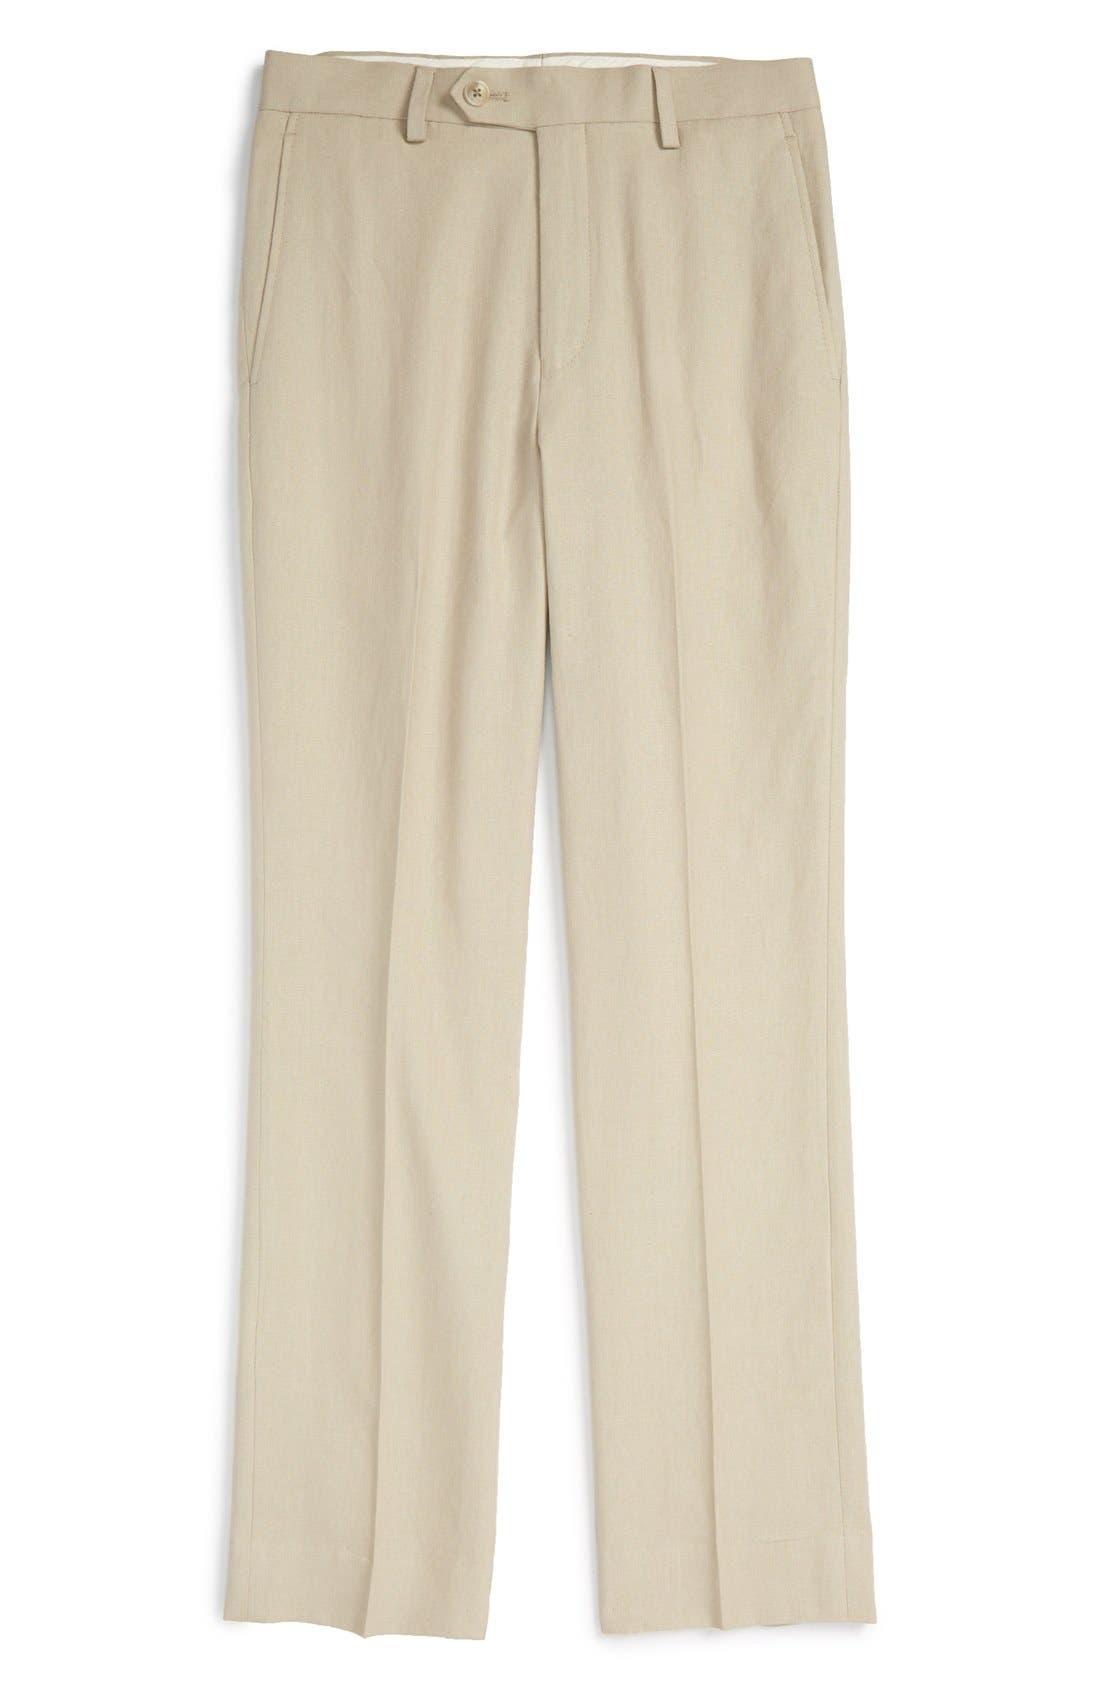 'Kirton' Flat Front Linen Blend Trousers, Main, color, TAN